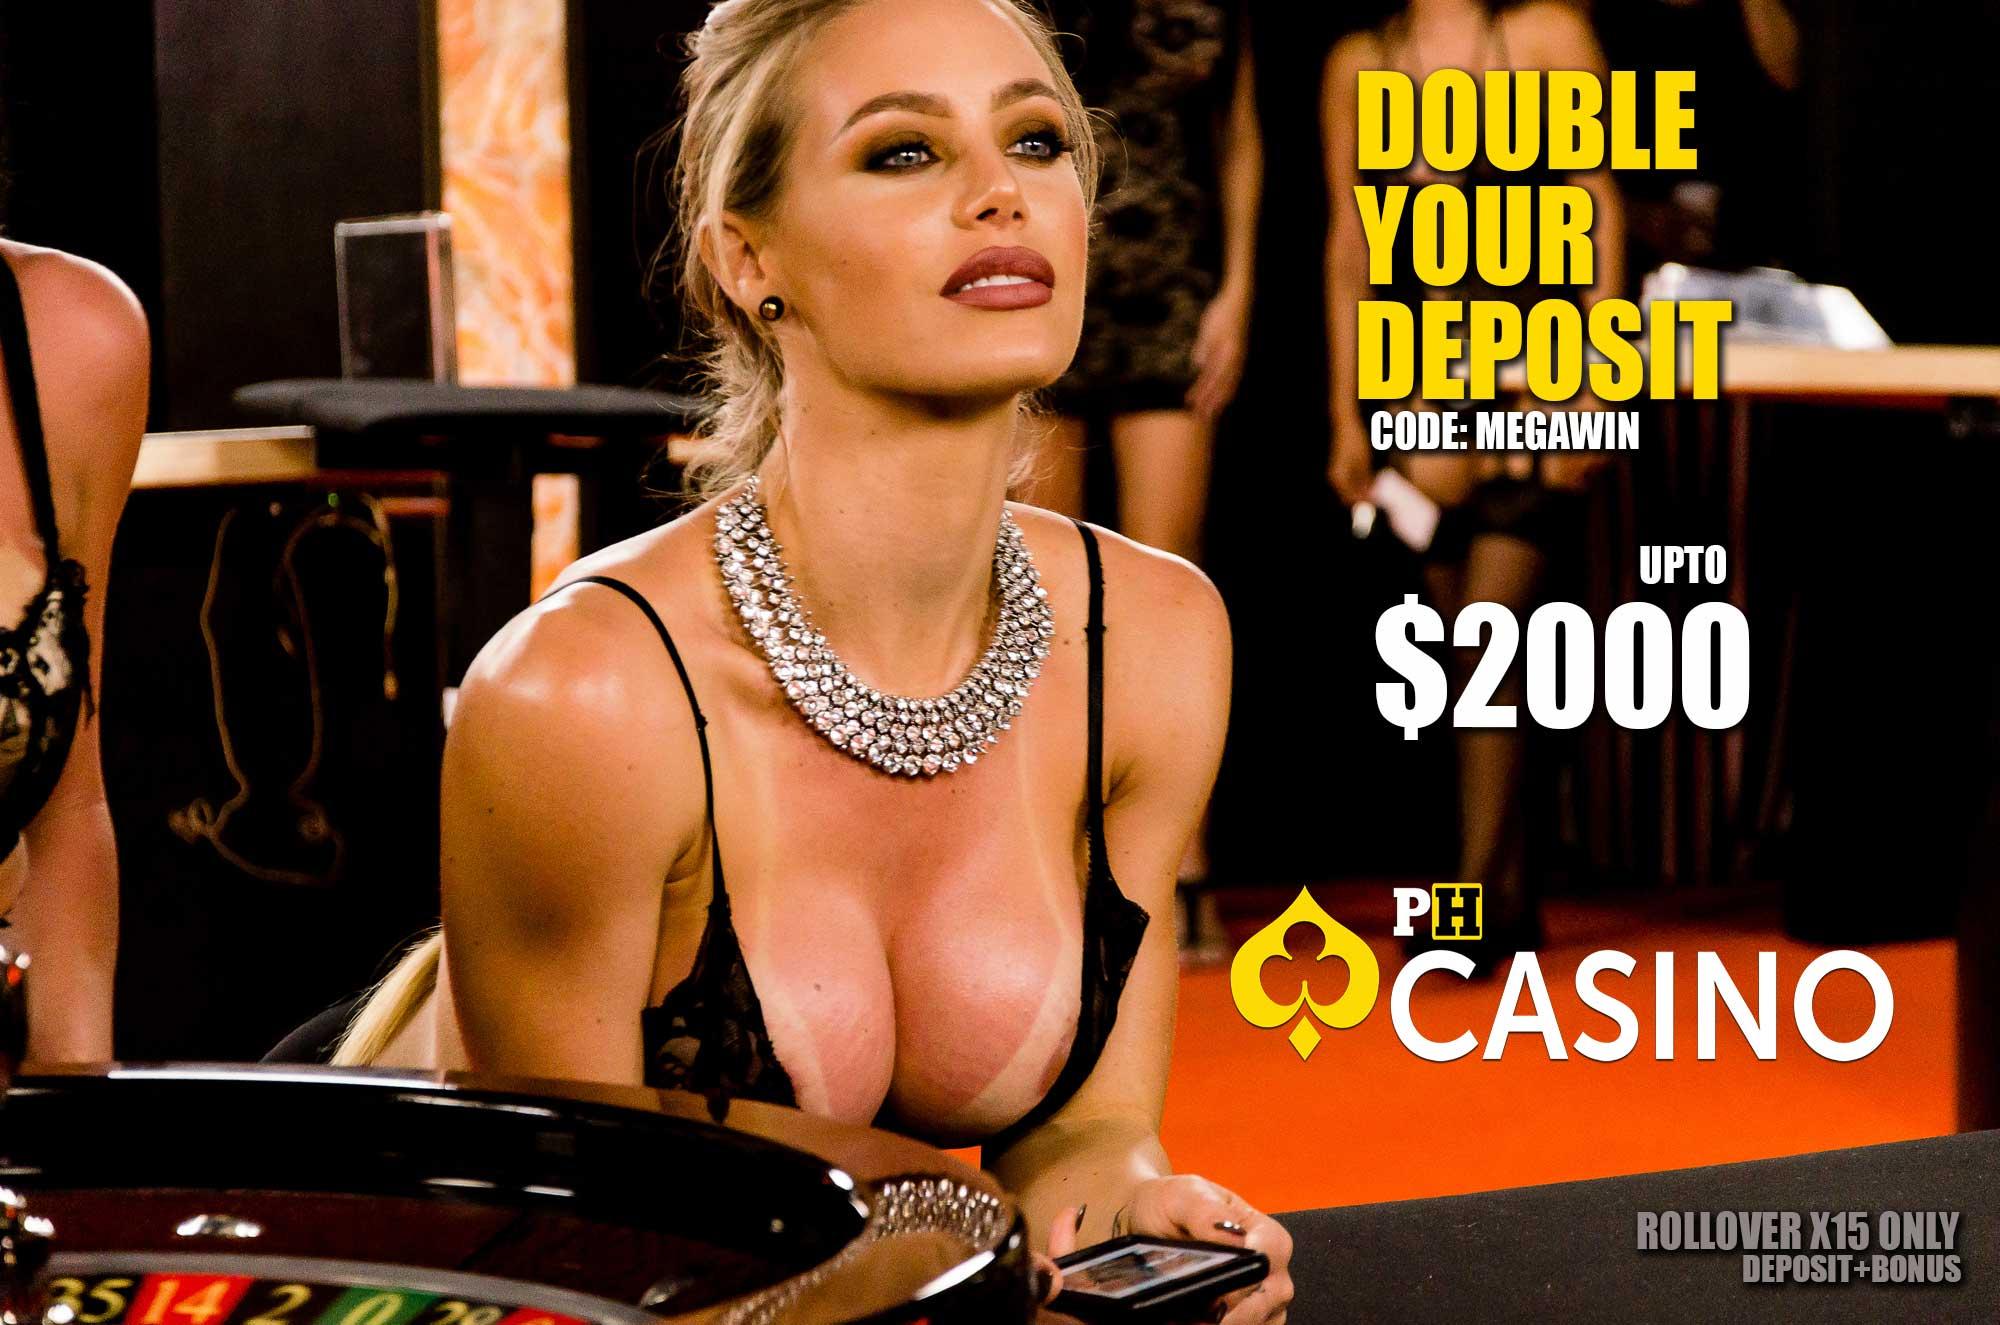 Promozione di Regina di cuori di PH Casino Blackjack